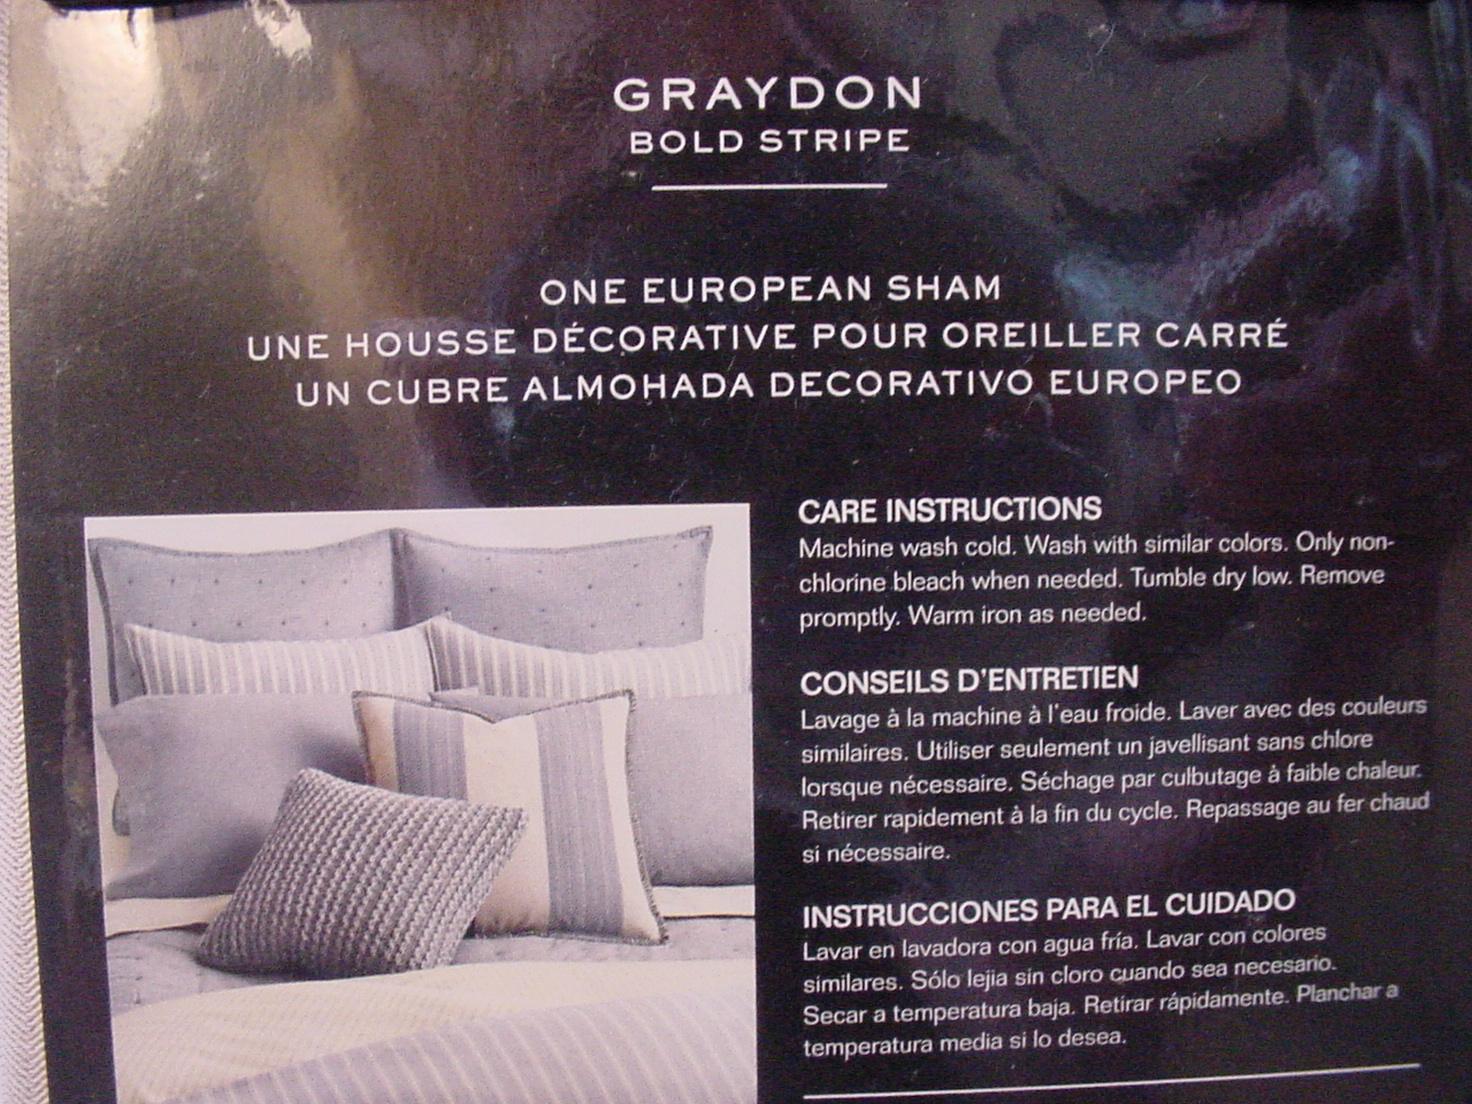 Ralph Lauren Graydon Bold Stripe Dune/Linen Beige/Ivory Euro Sham